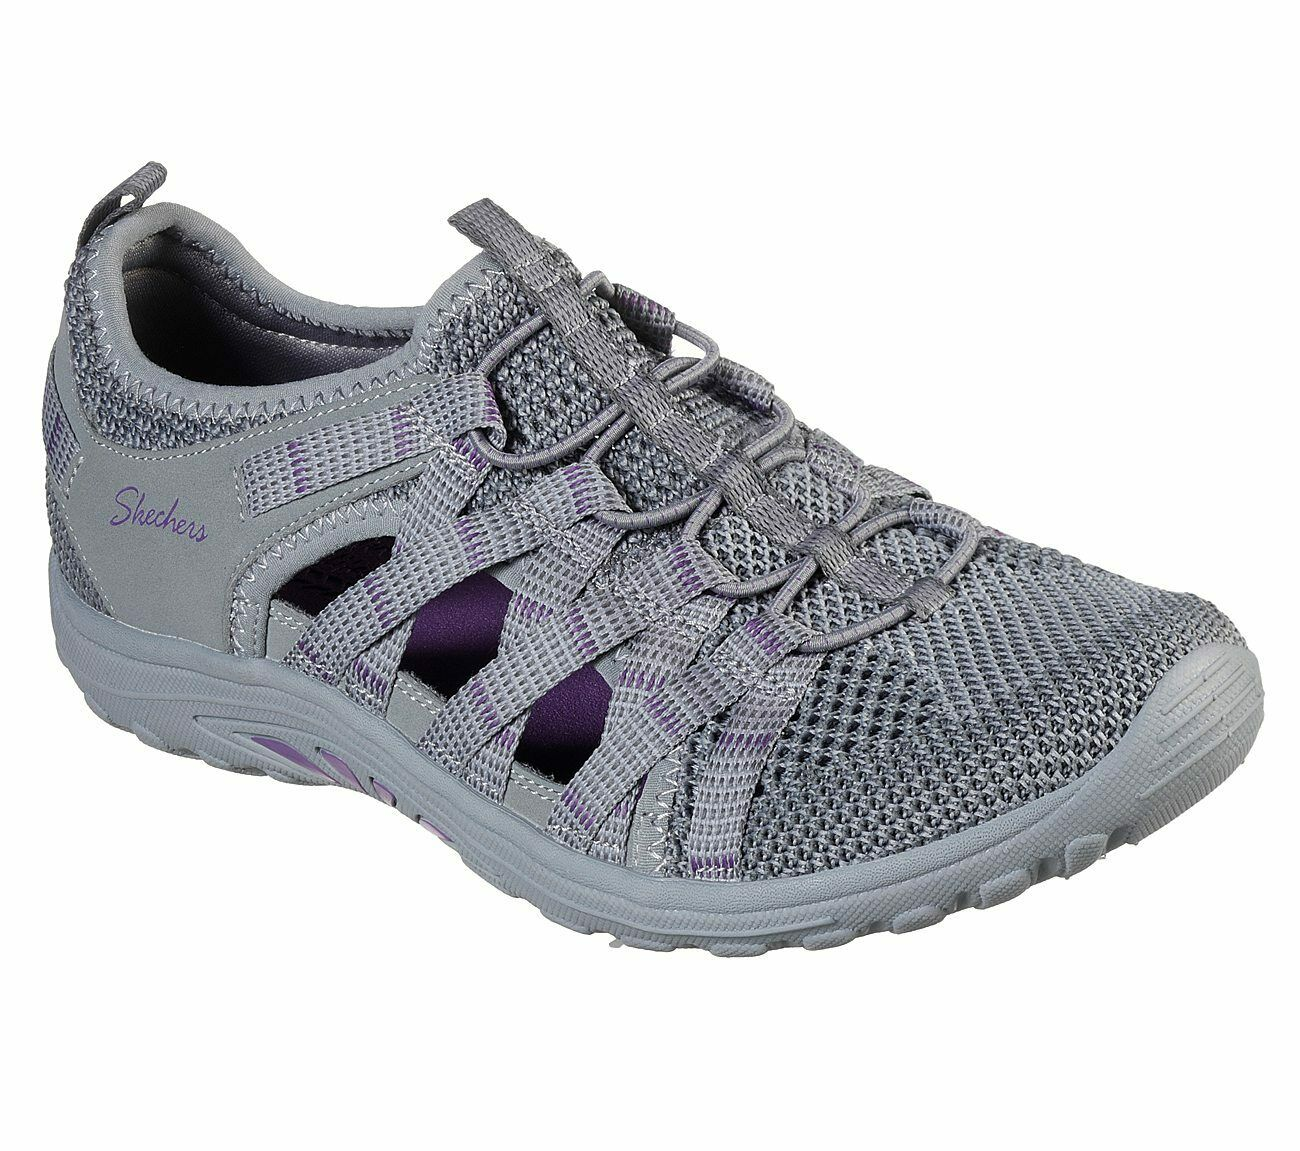 New Skechers Ladies shoes Outdoor Sandals Reggae Slippers Women's Sneakers